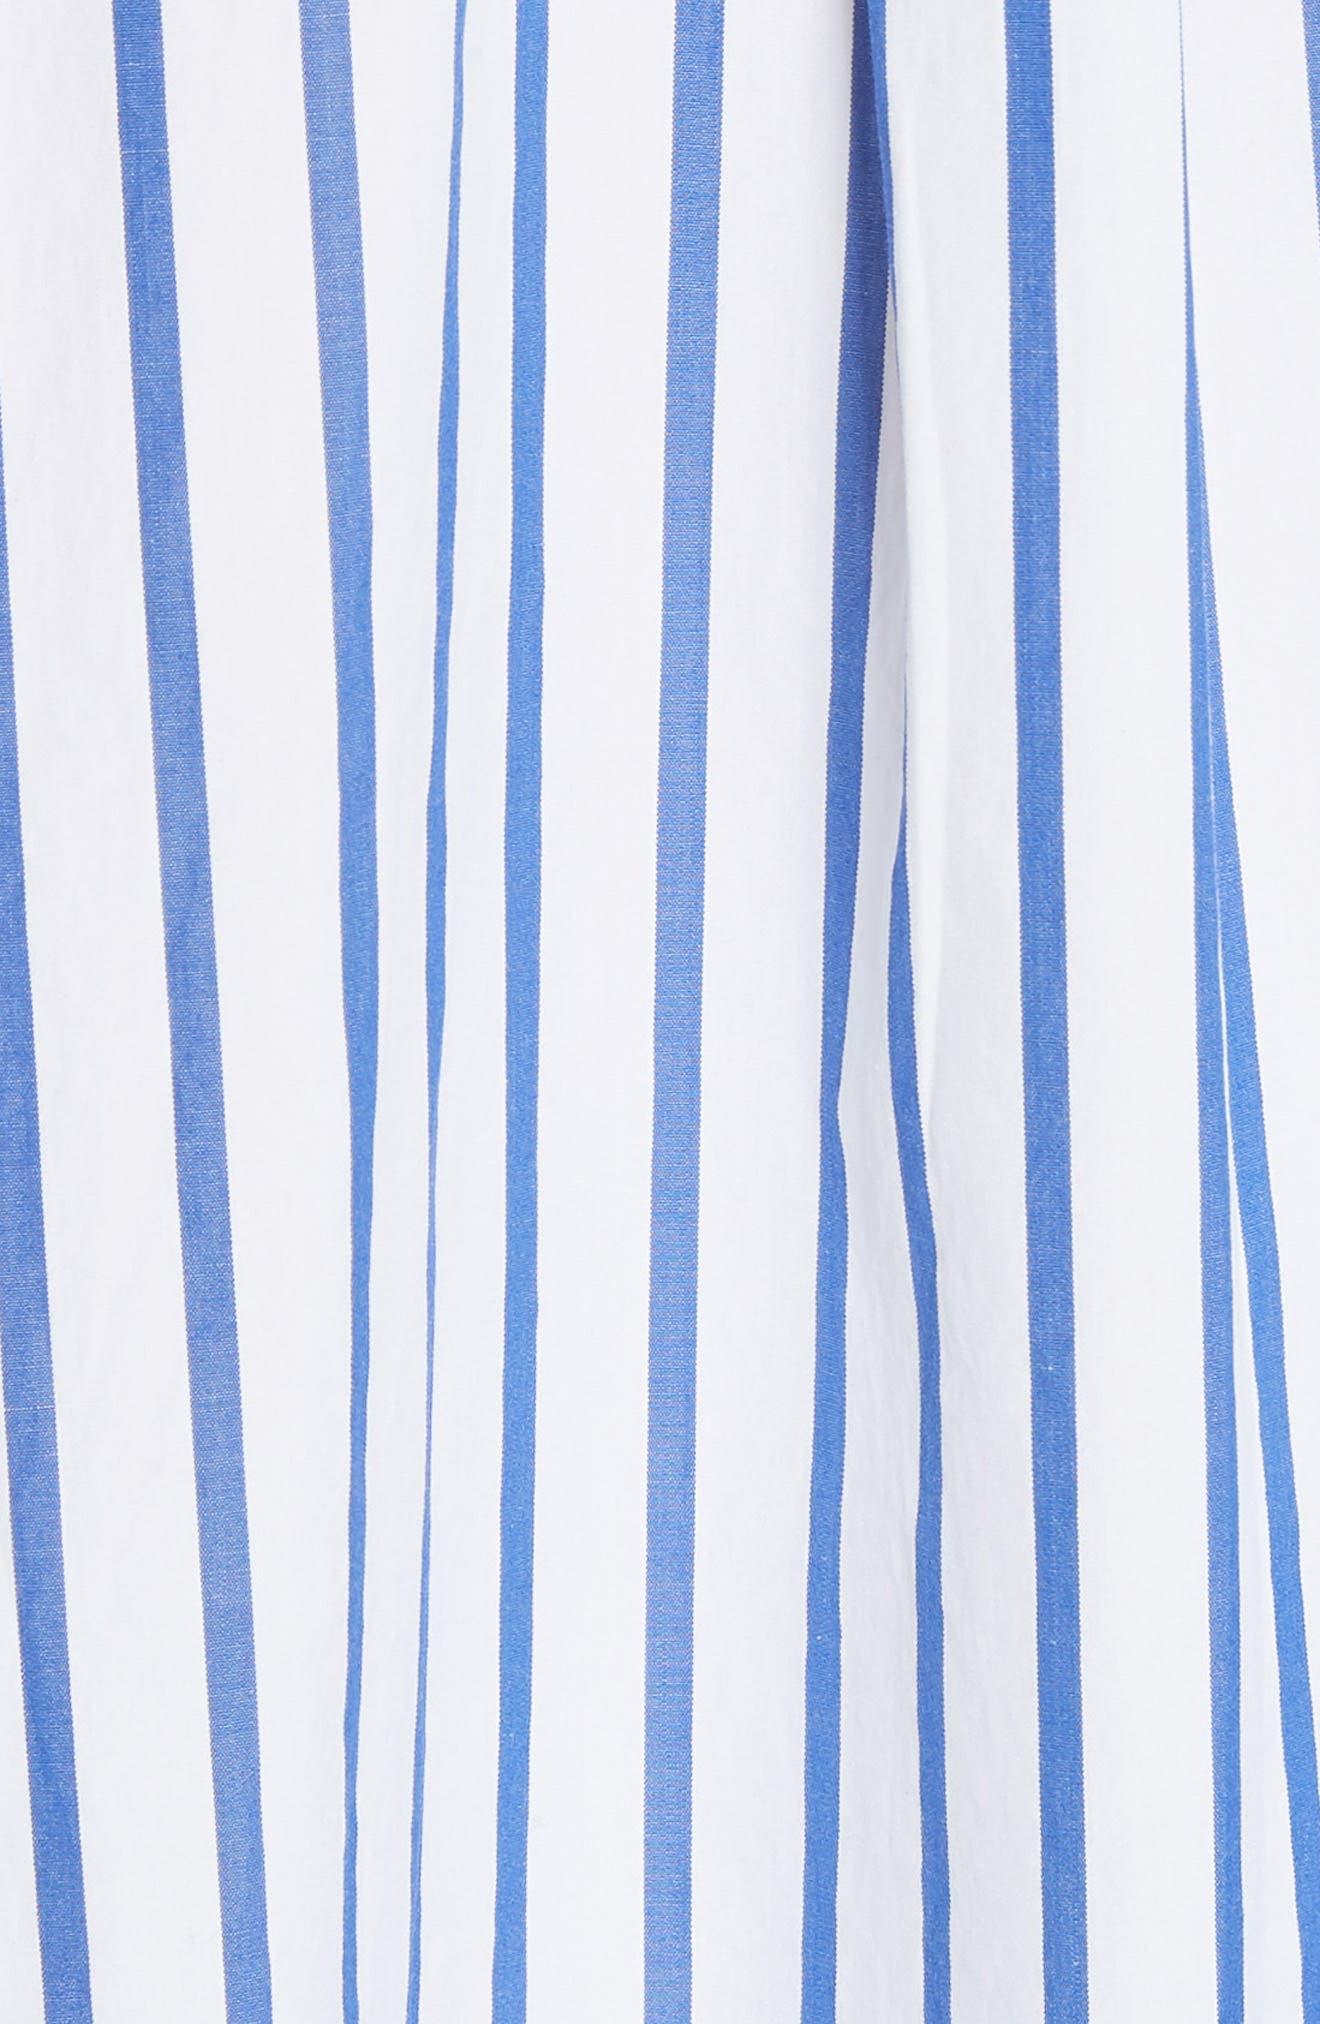 Oversize Stripe Woven Shirt,                             Alternate thumbnail 5, color,                             400